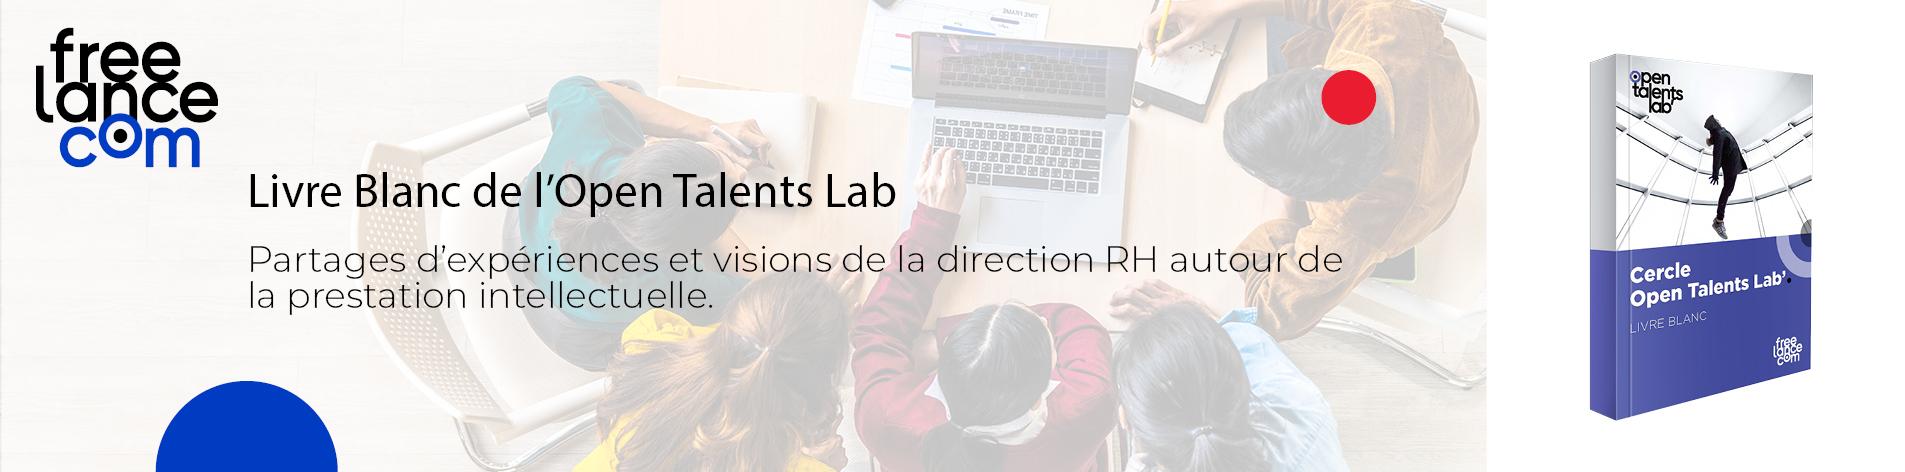 Livre Blanc Open Talents Lab